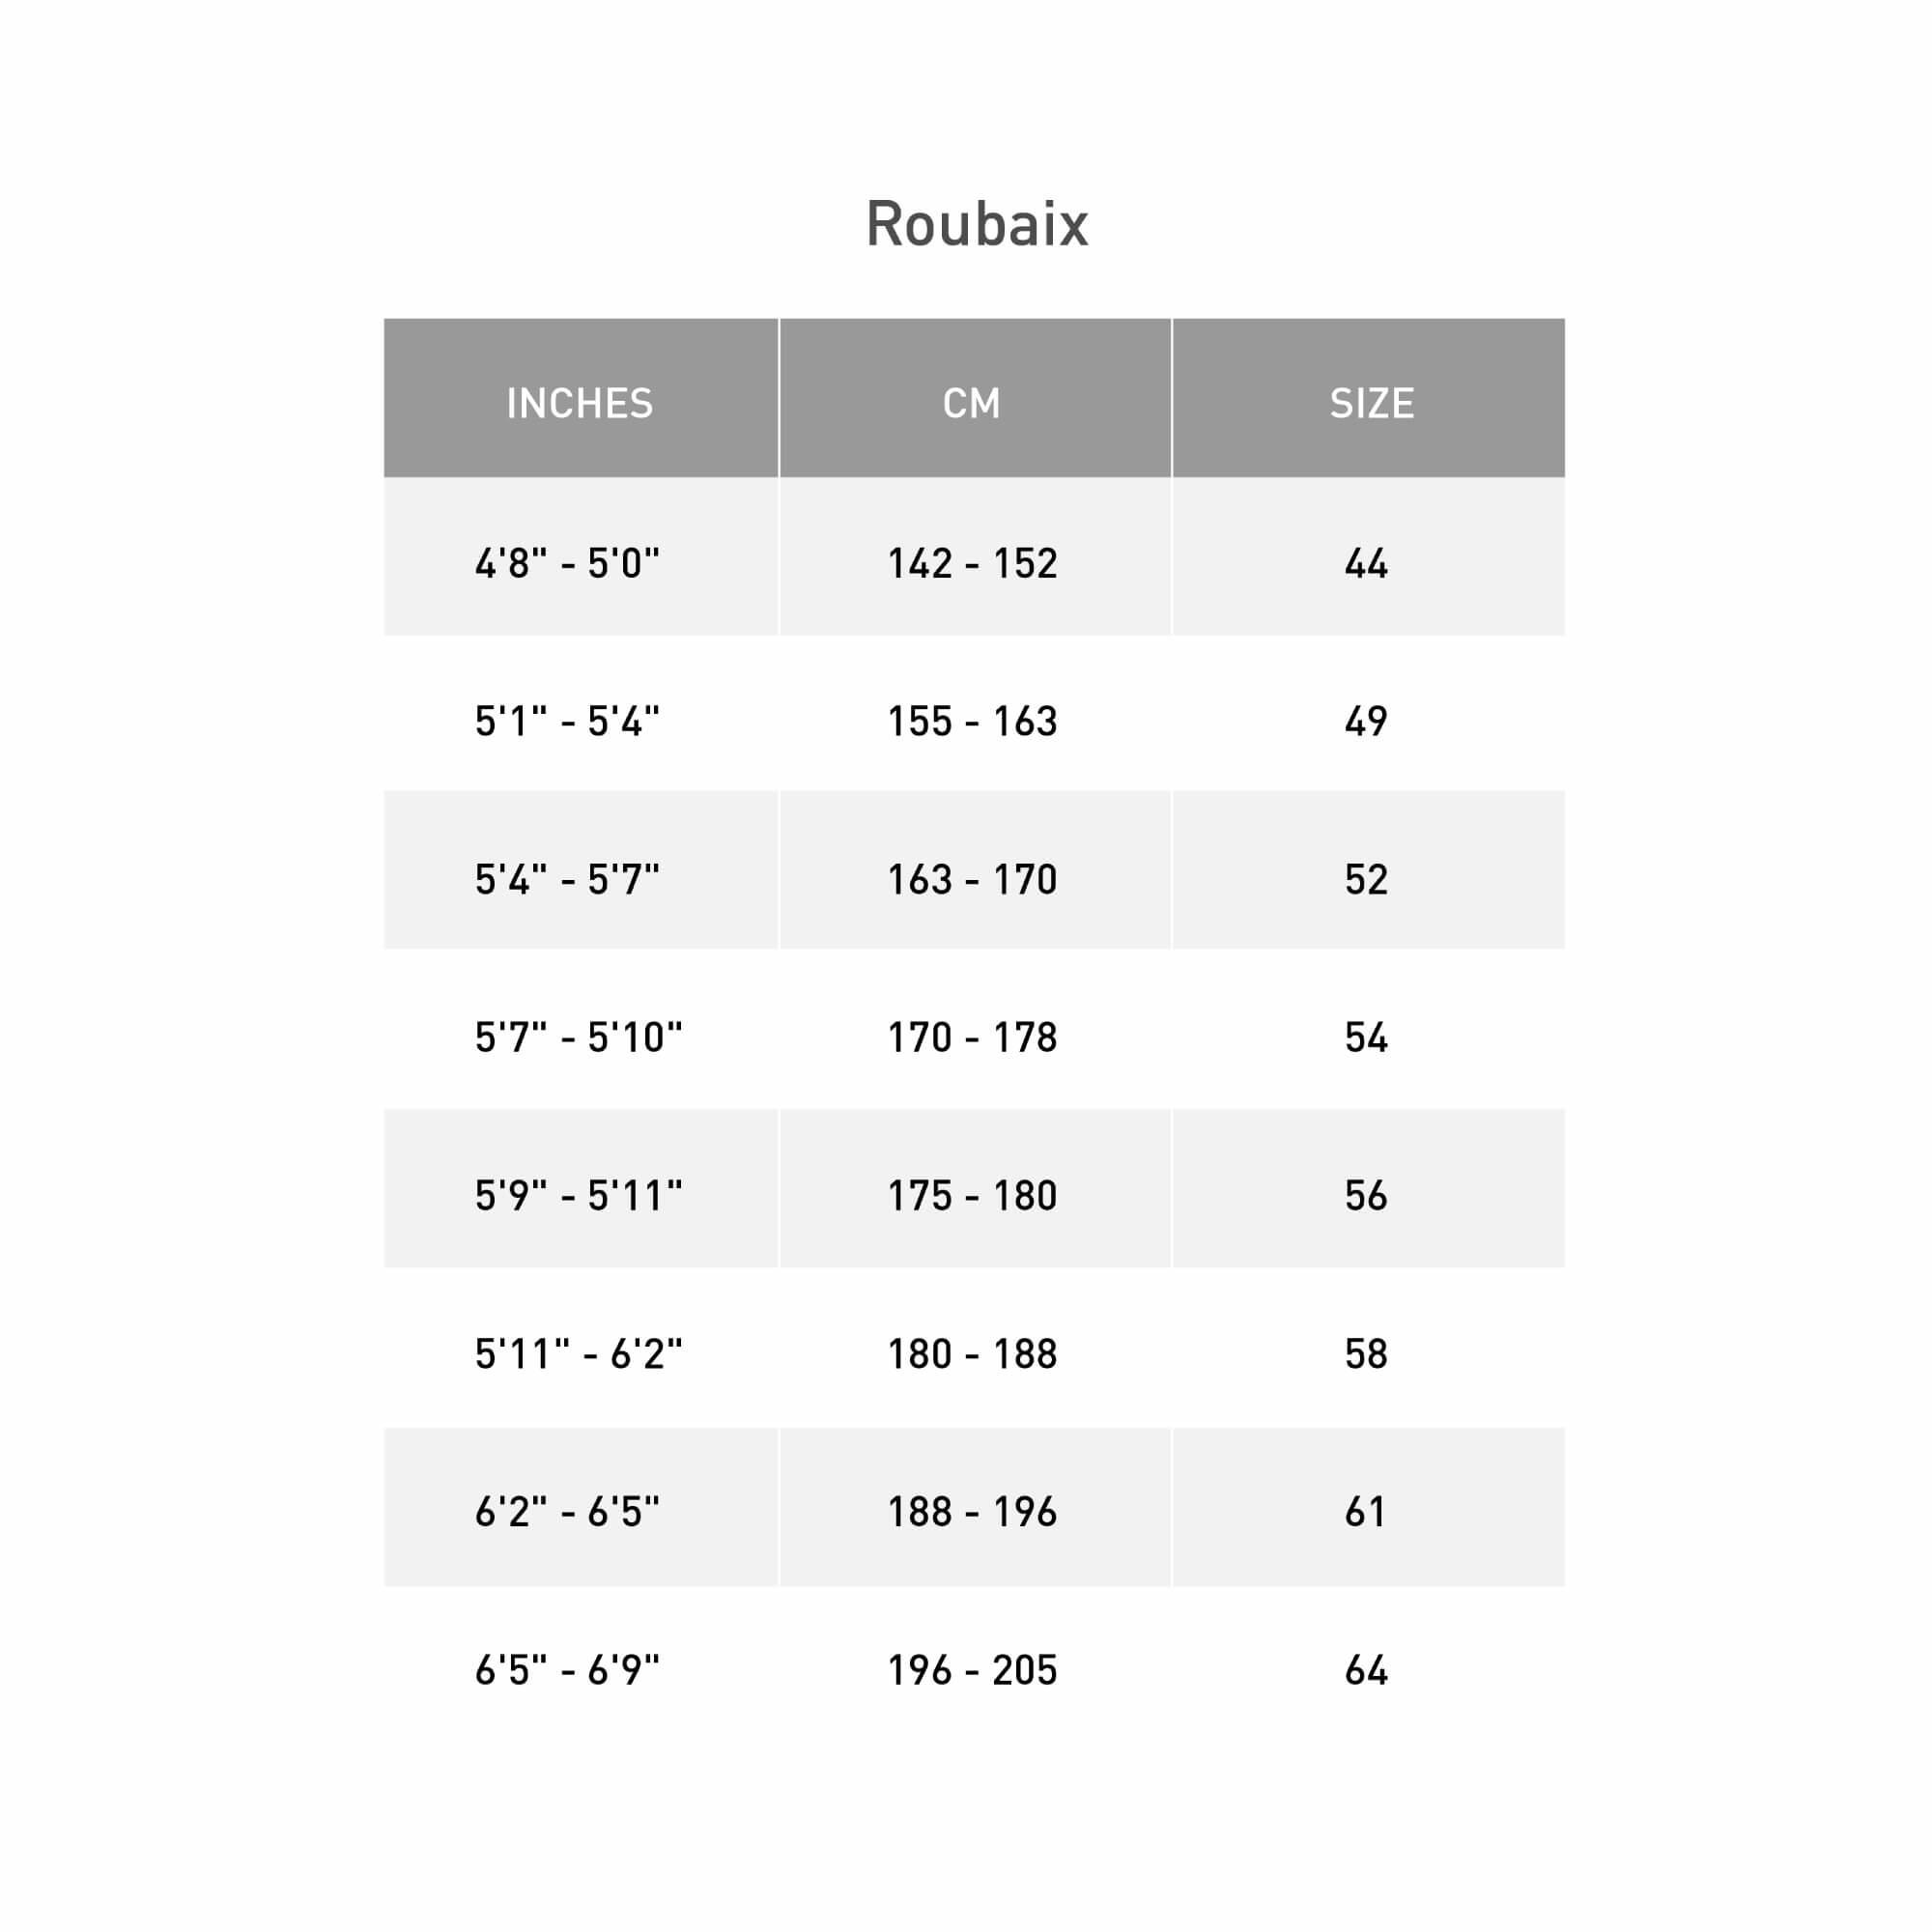 Roubaix Expert 2021-5